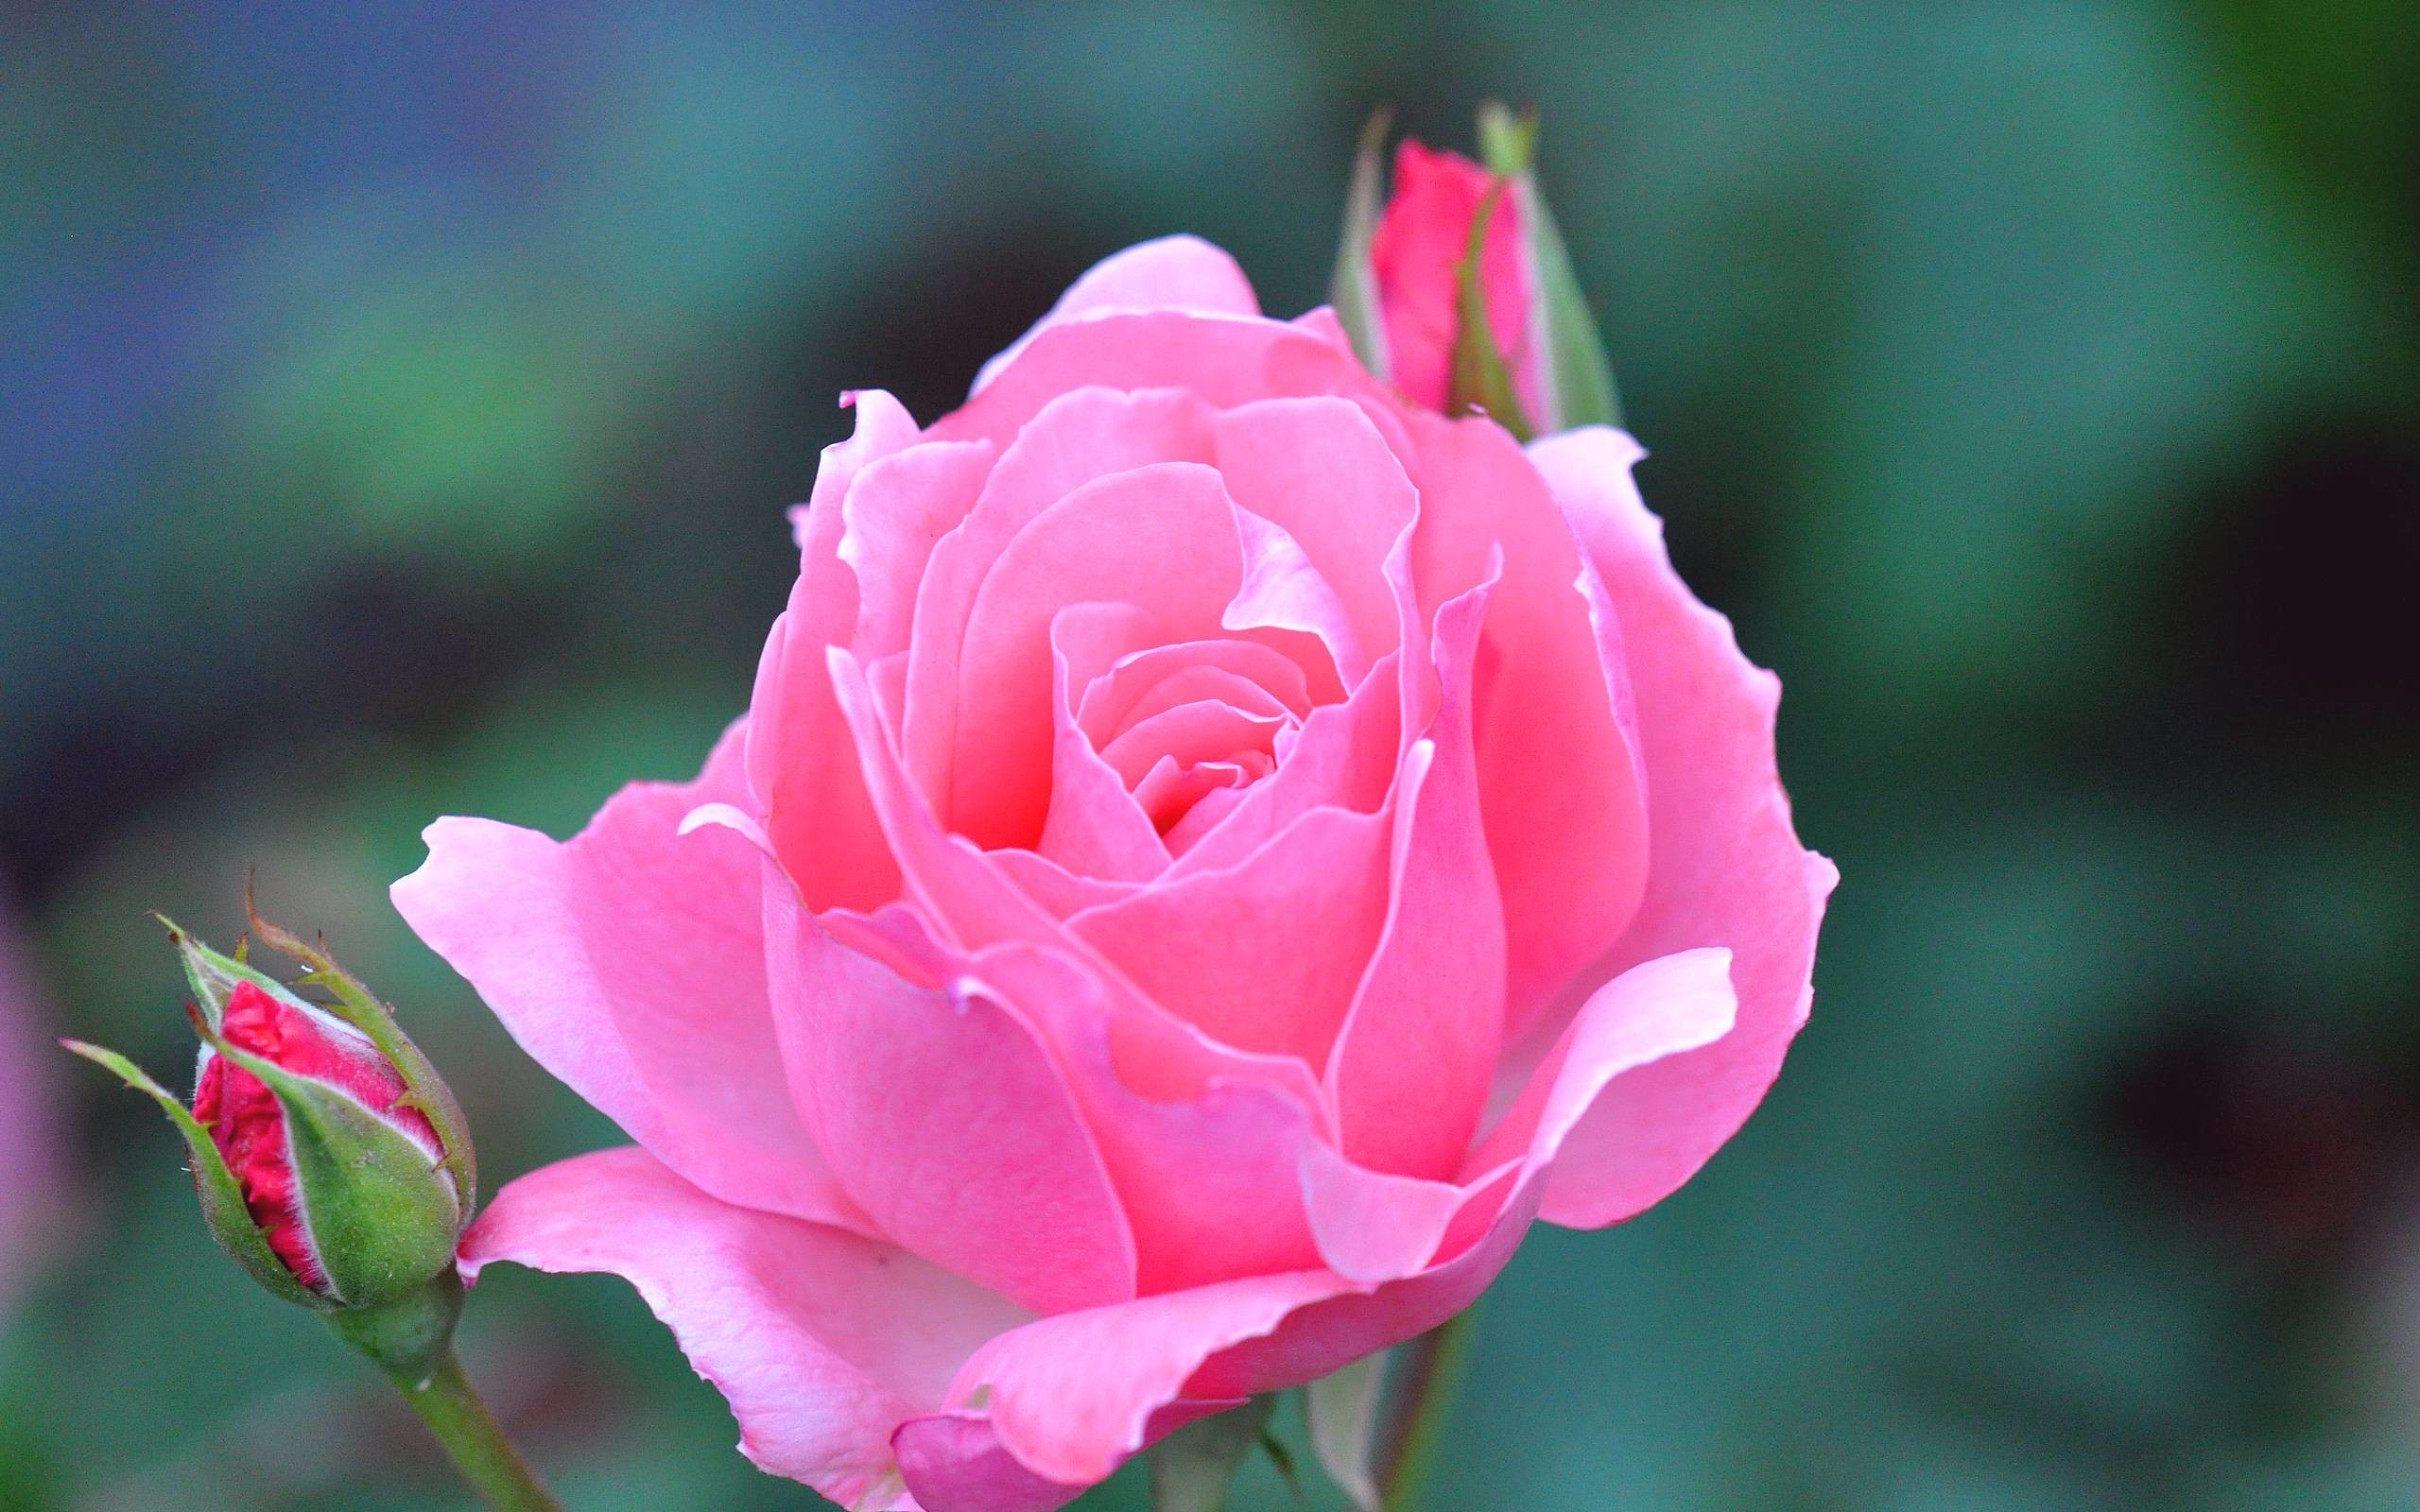 Roses Wallpaper Desktop 48 images